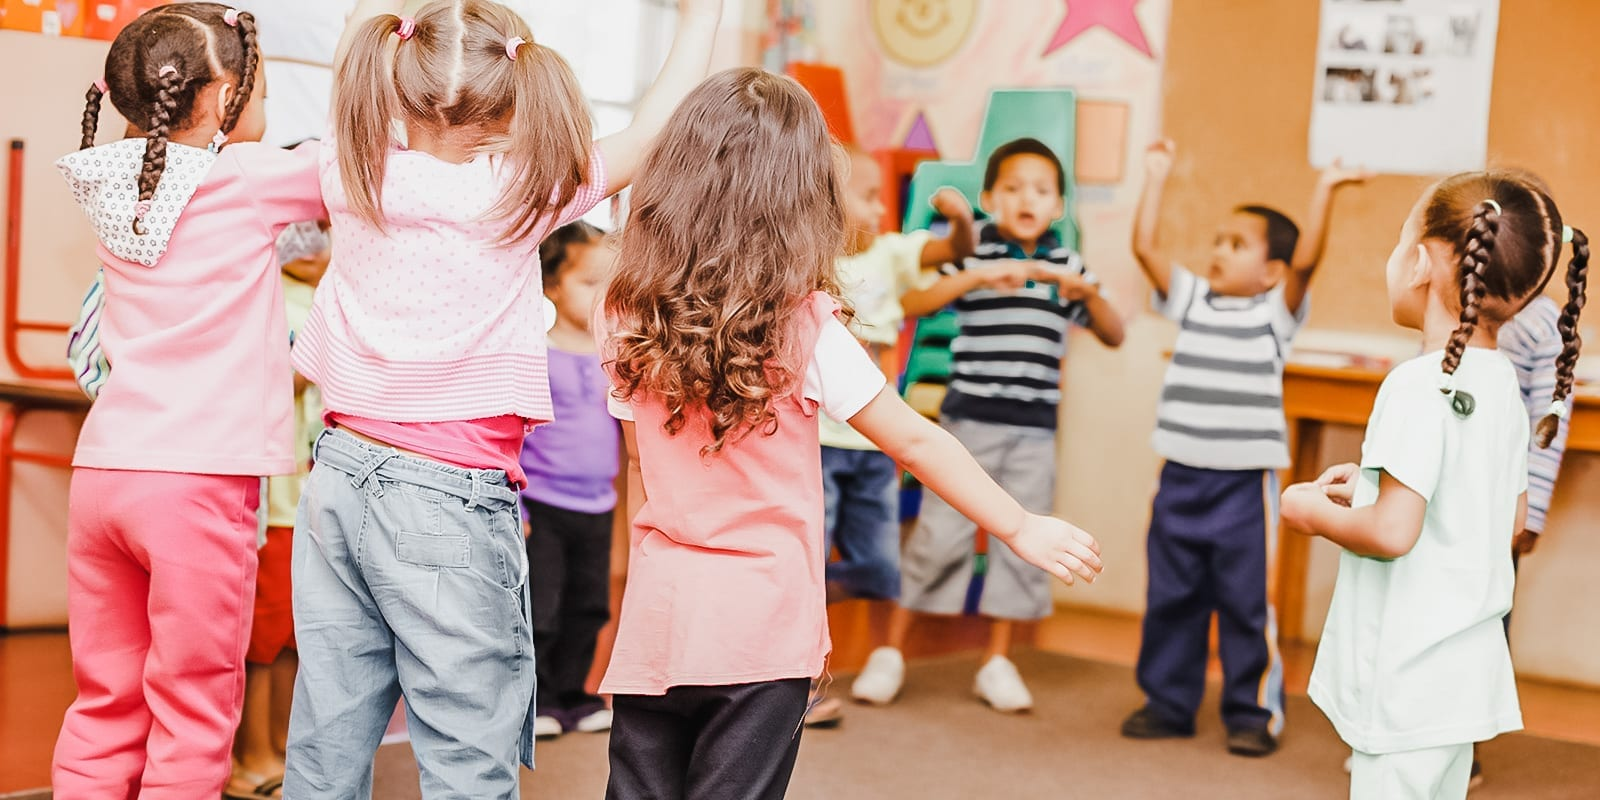 A preschool class dancing in the classroom